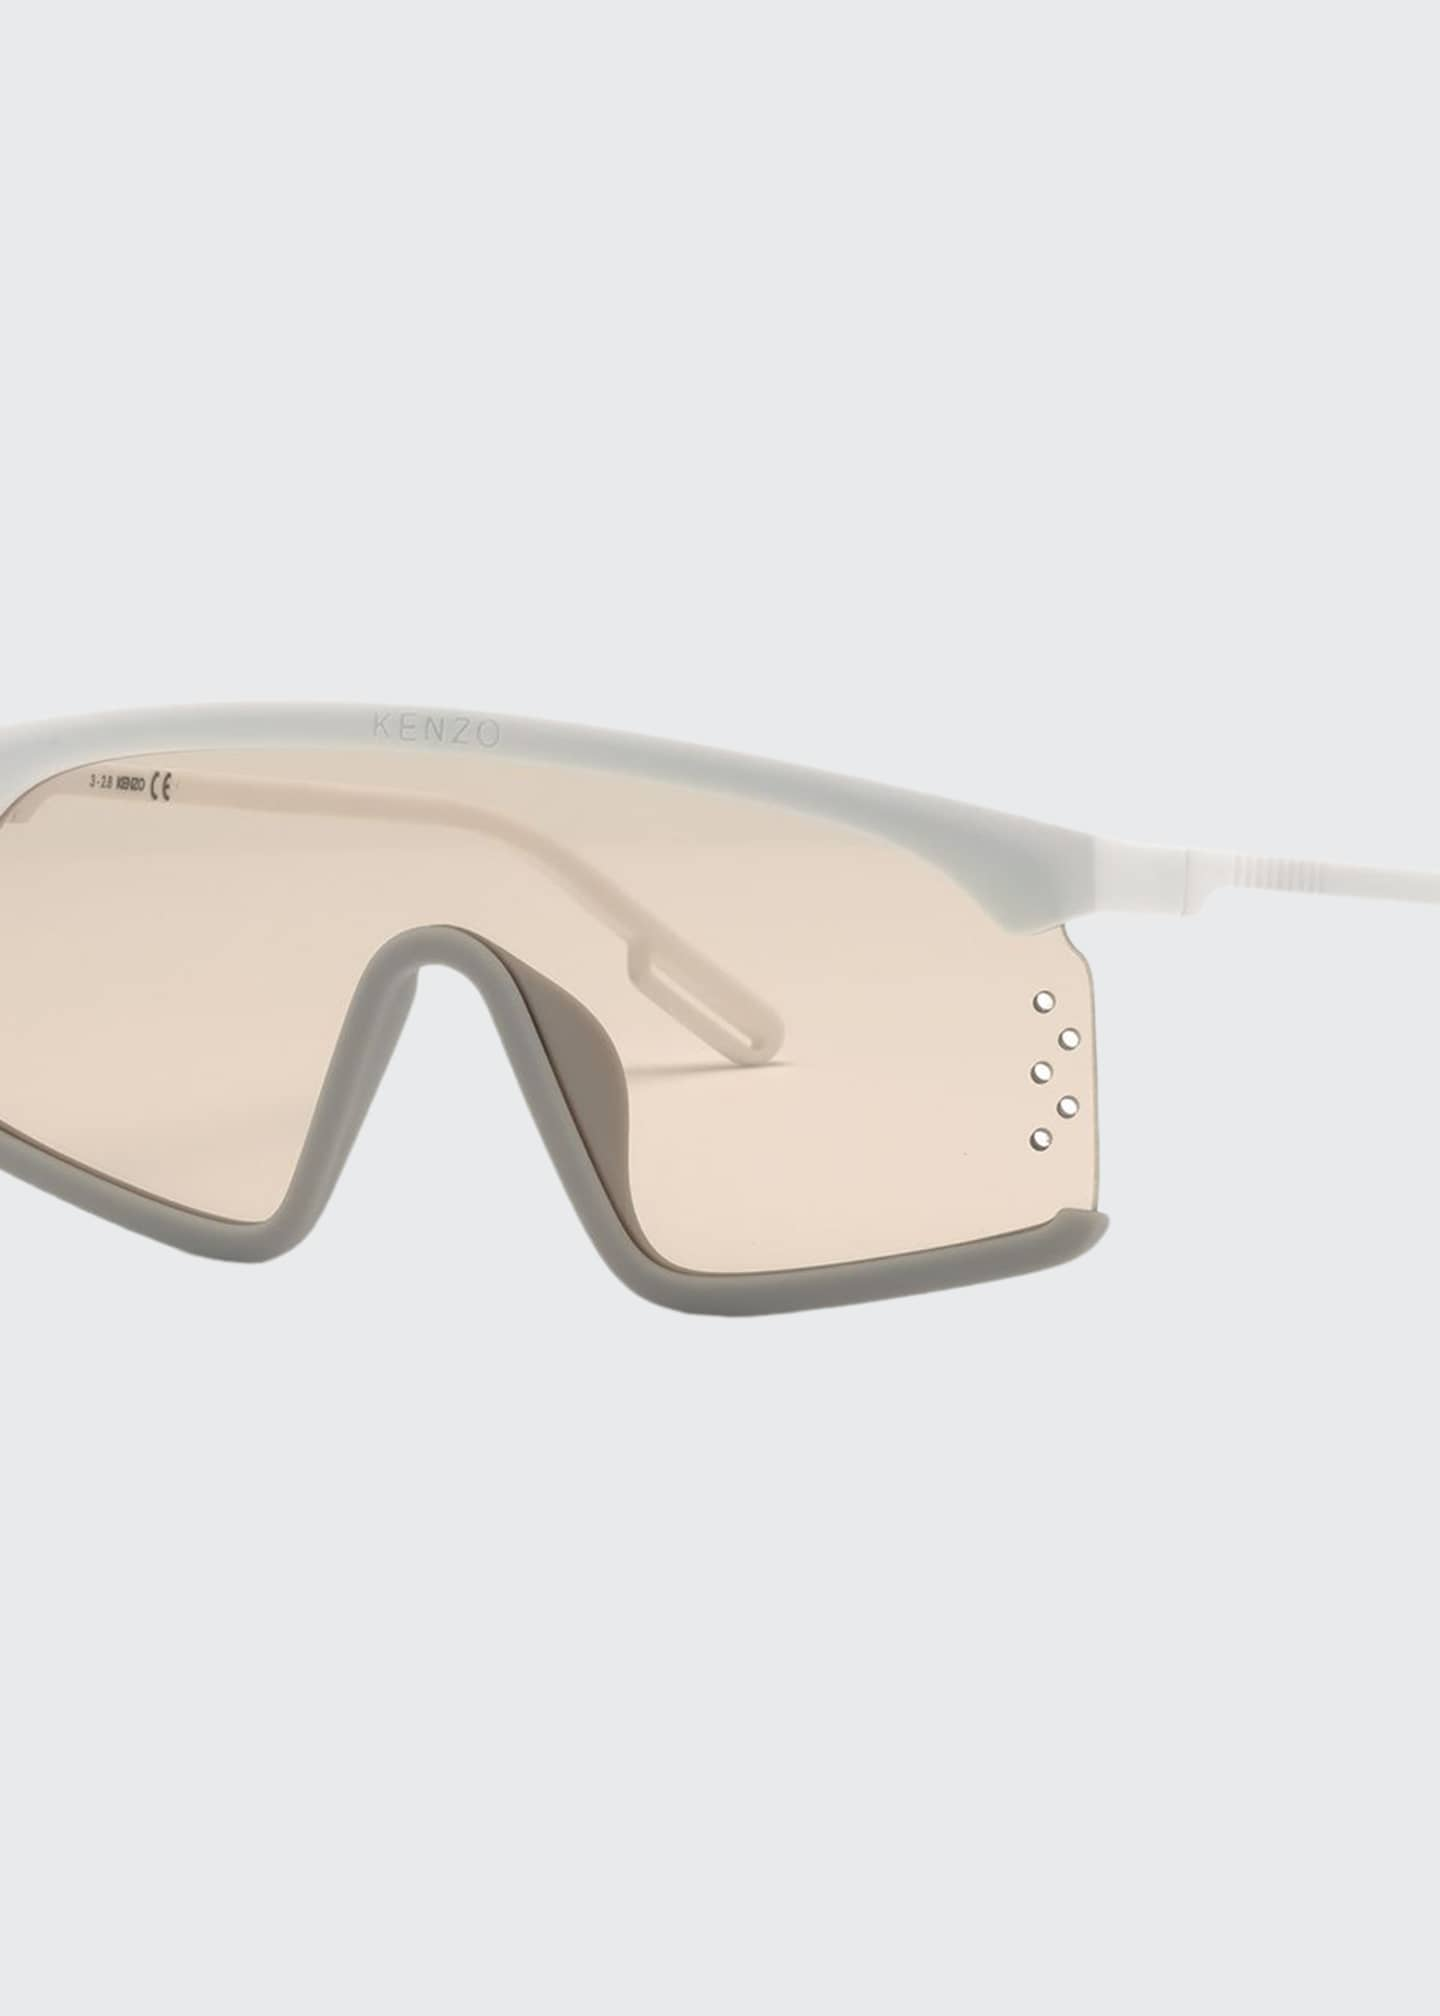 Kenzo Men's Shield Injected Plastic Sunglasses